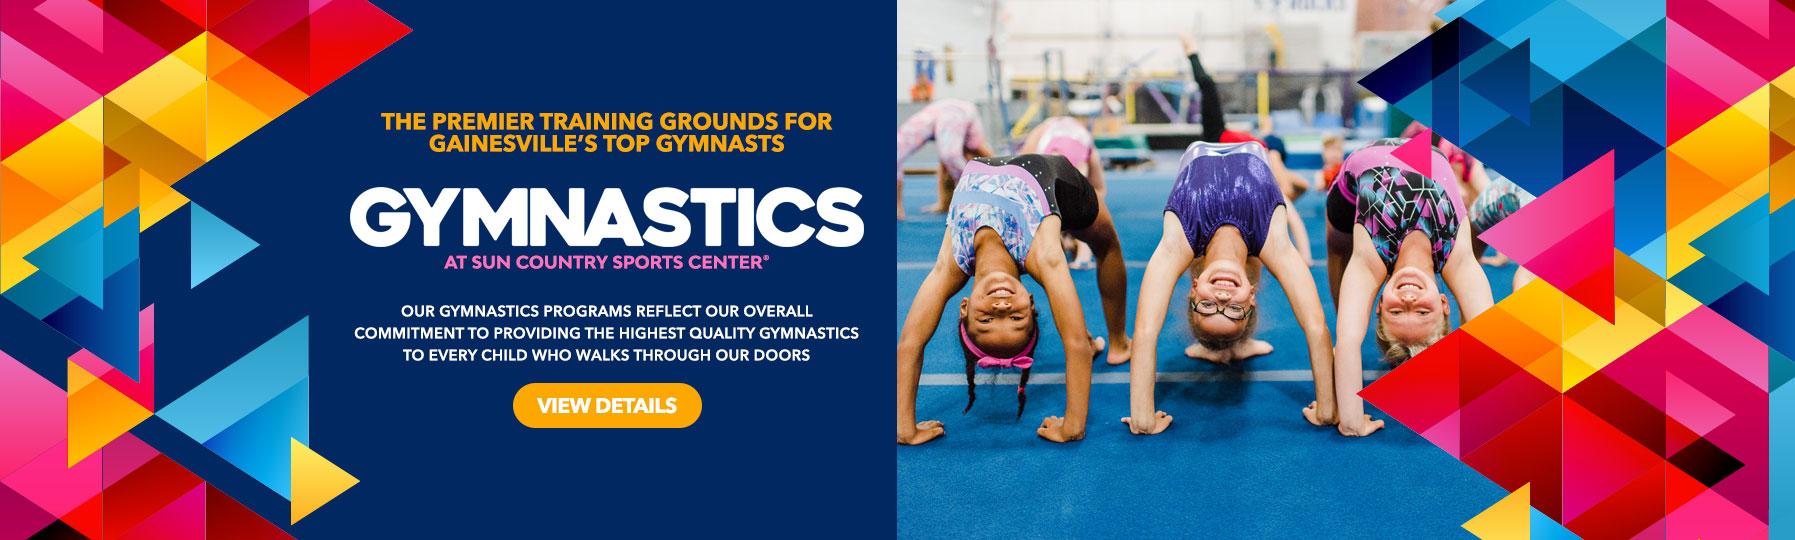 gymnastics-main-0521